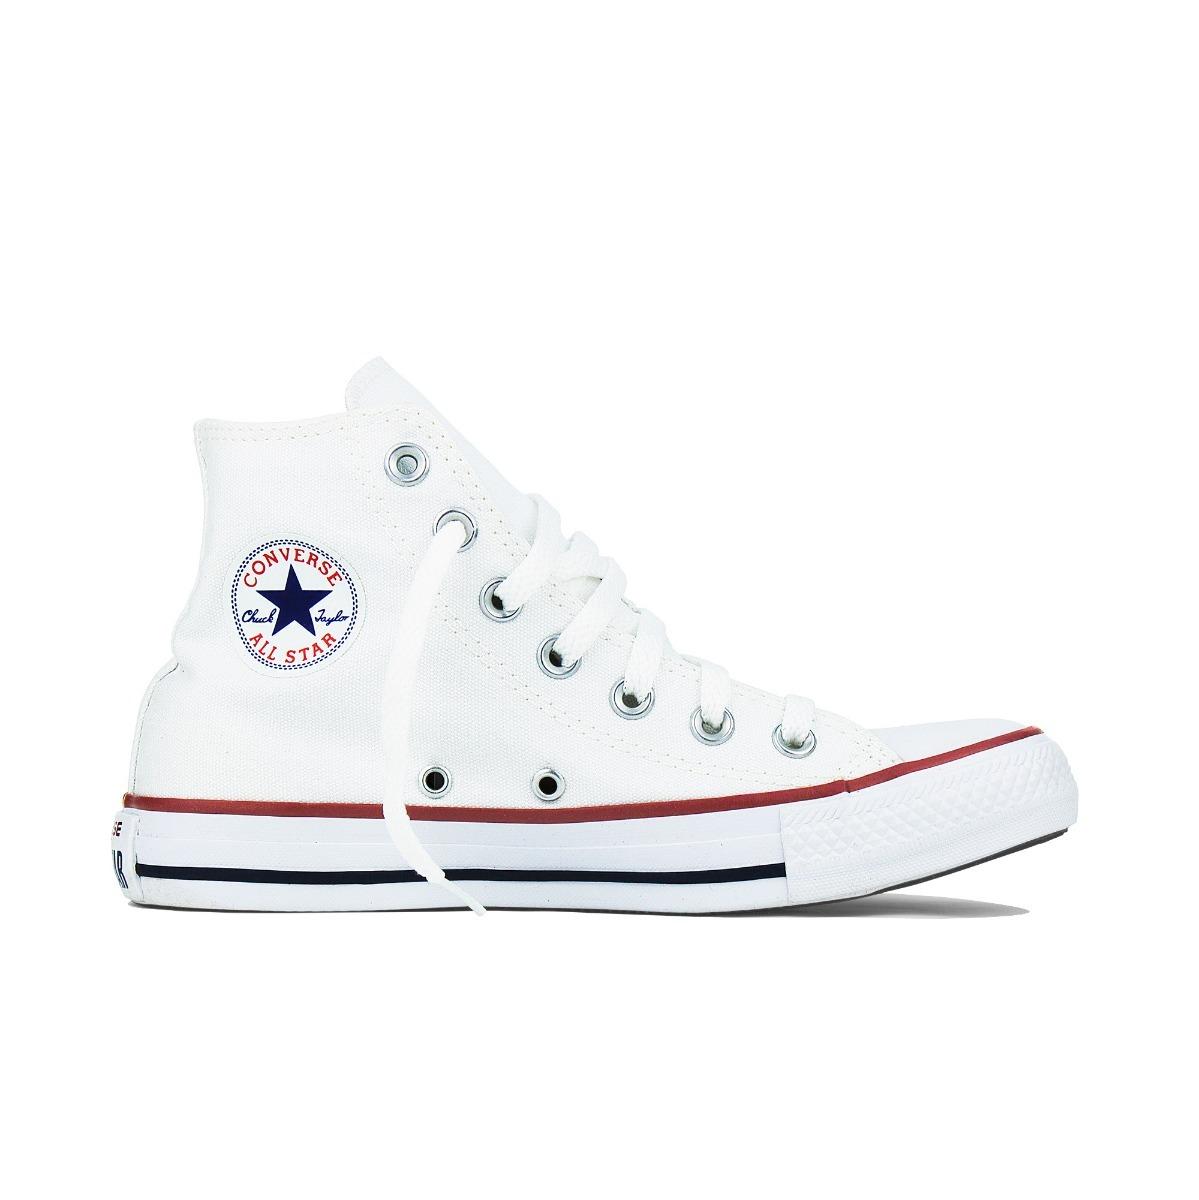 8a1ed9a74d540 tênis converse all star chuck taylor cano alto branco tecido. Carregando  zoom.